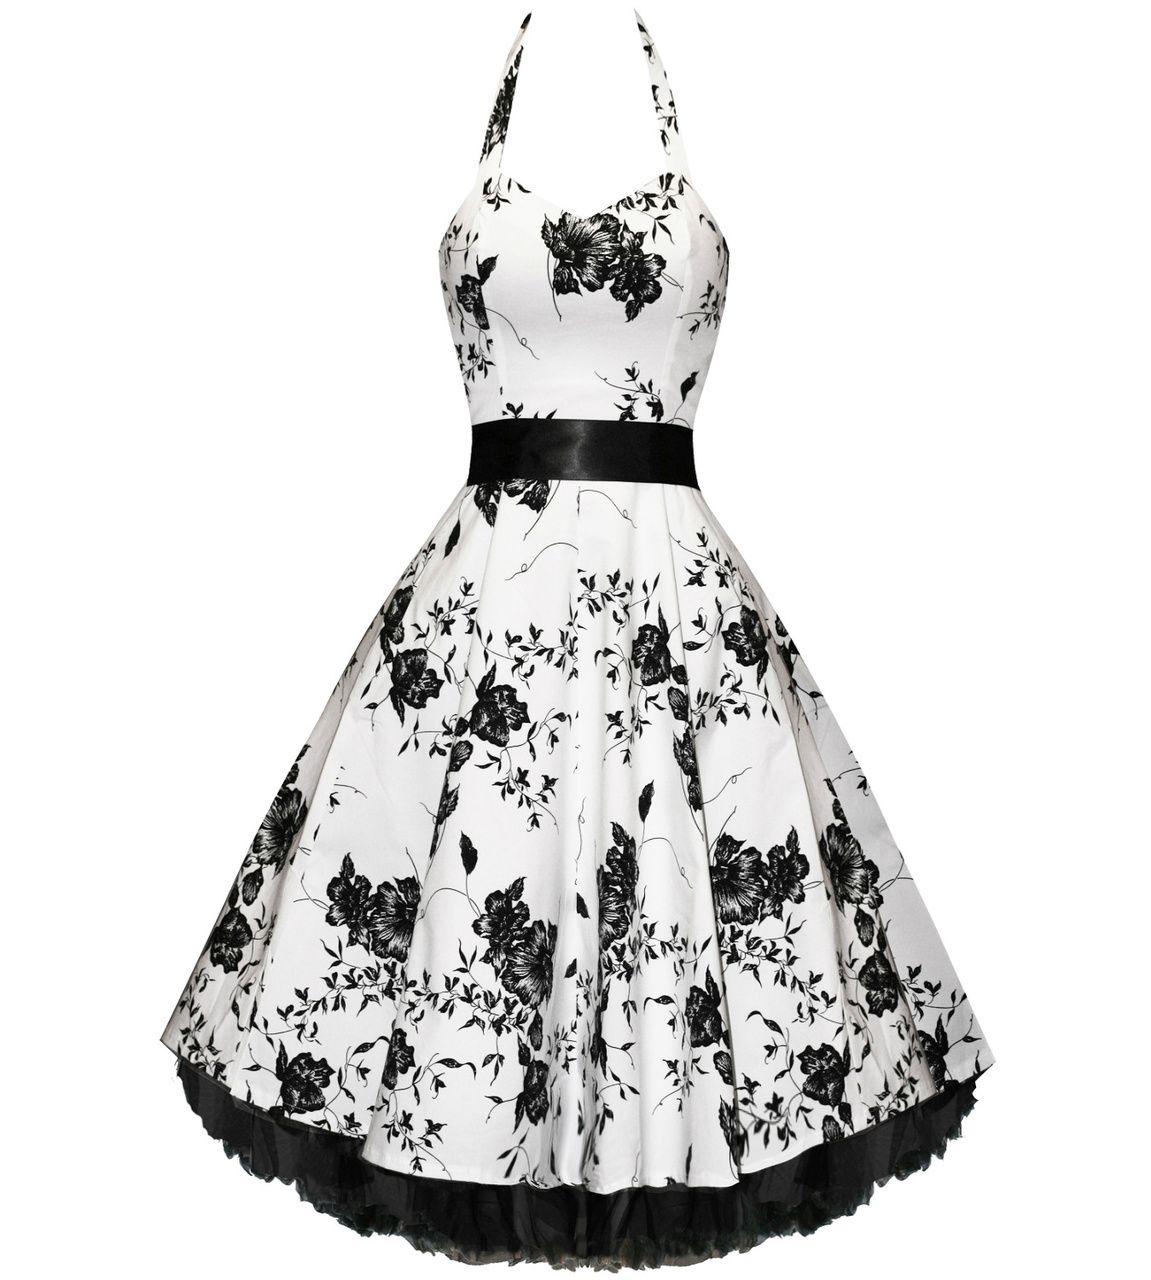 Floral White Black Halter Dress Fashion Western Dresses For Women Rockabilly Dress [ 1280 x 1151 Pixel ]